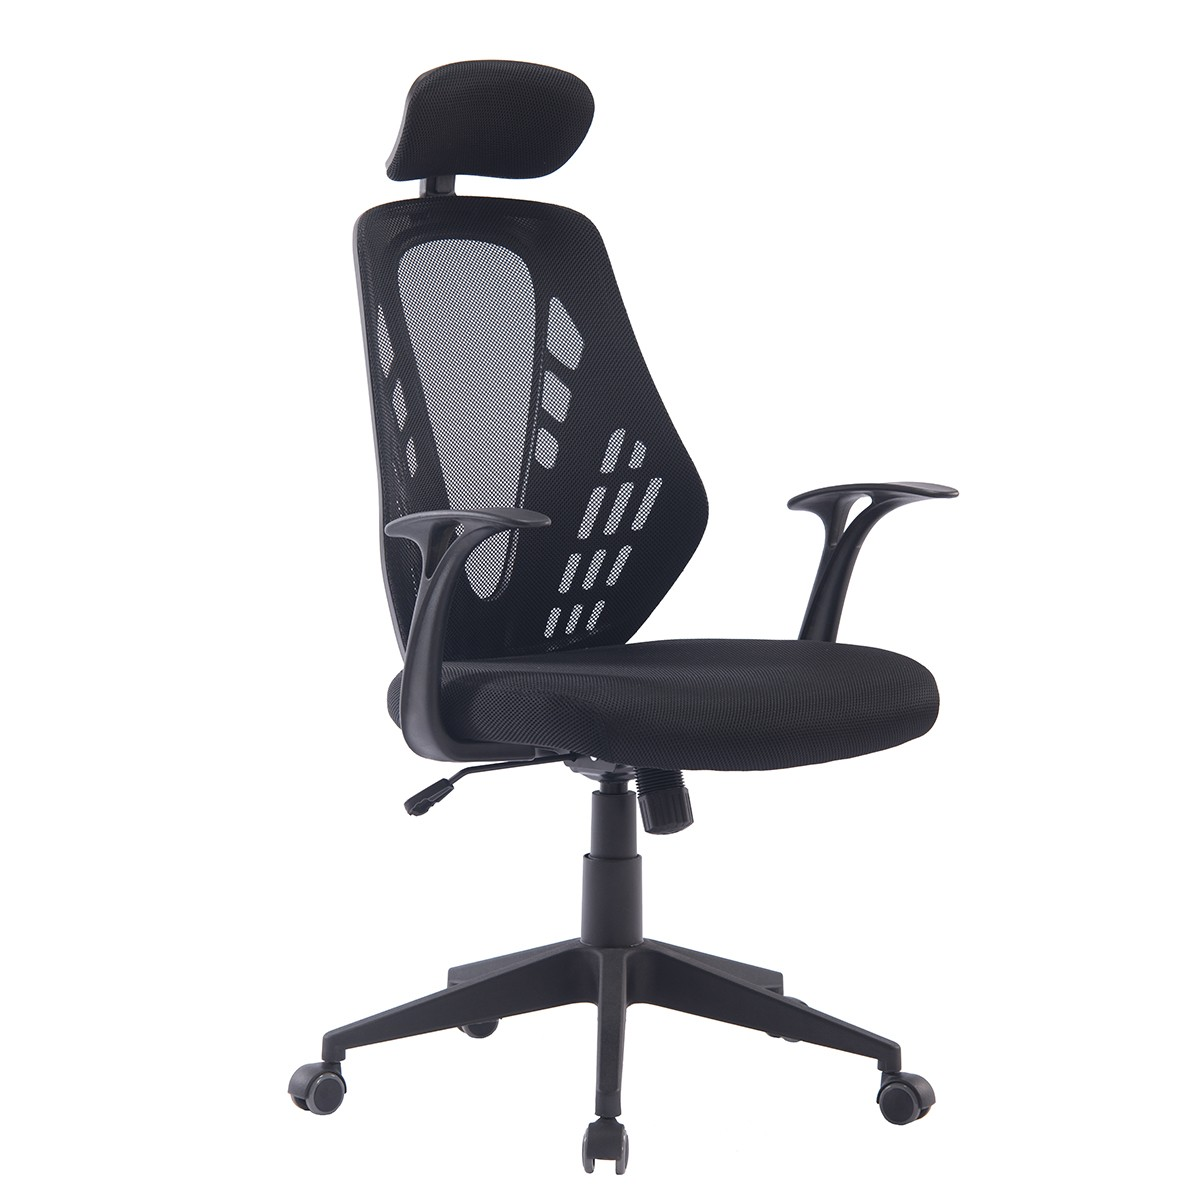 Office Armchair VELDEN, Gas, Rocker, Mesh And Black Fabric